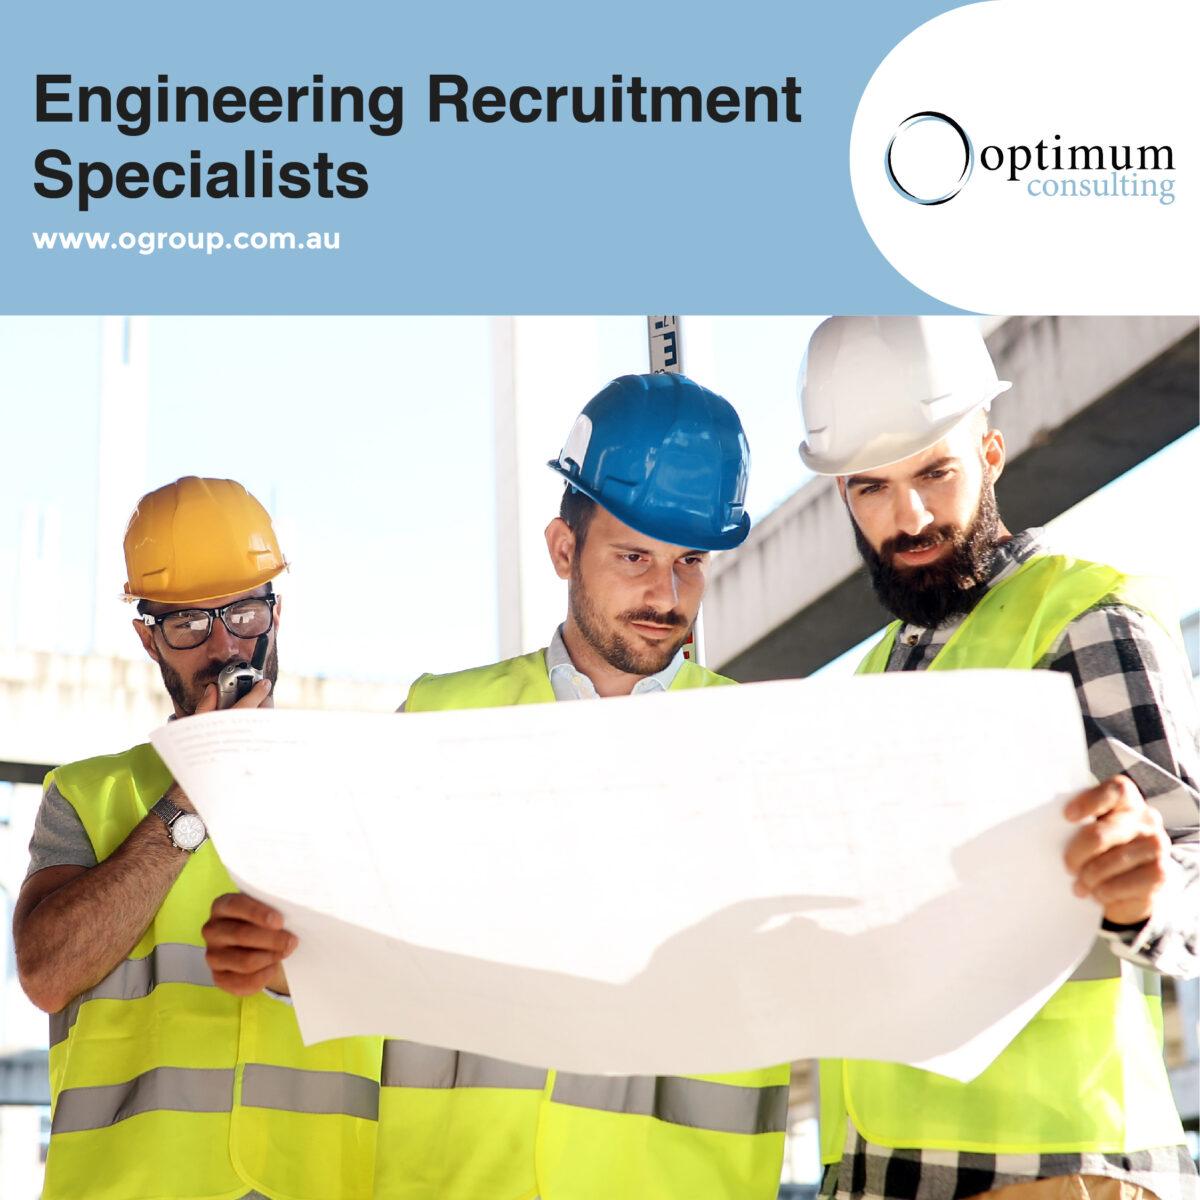 Brisbane engineering recruiters